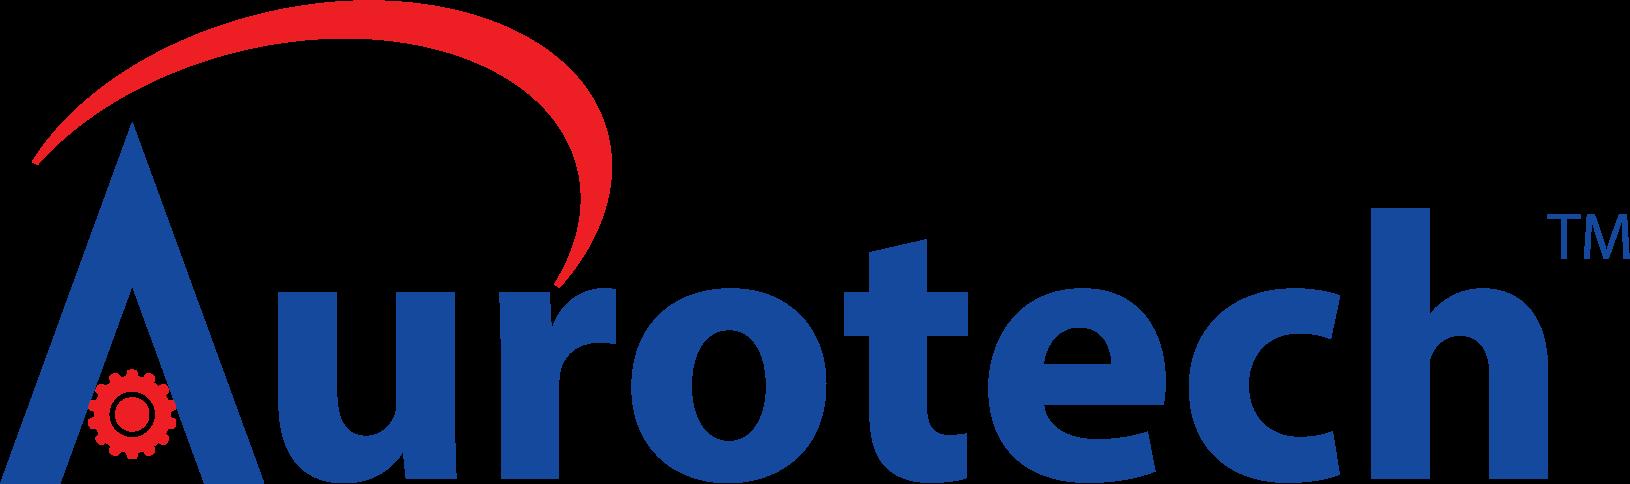 Aurotech-Logo-Illustrator.png